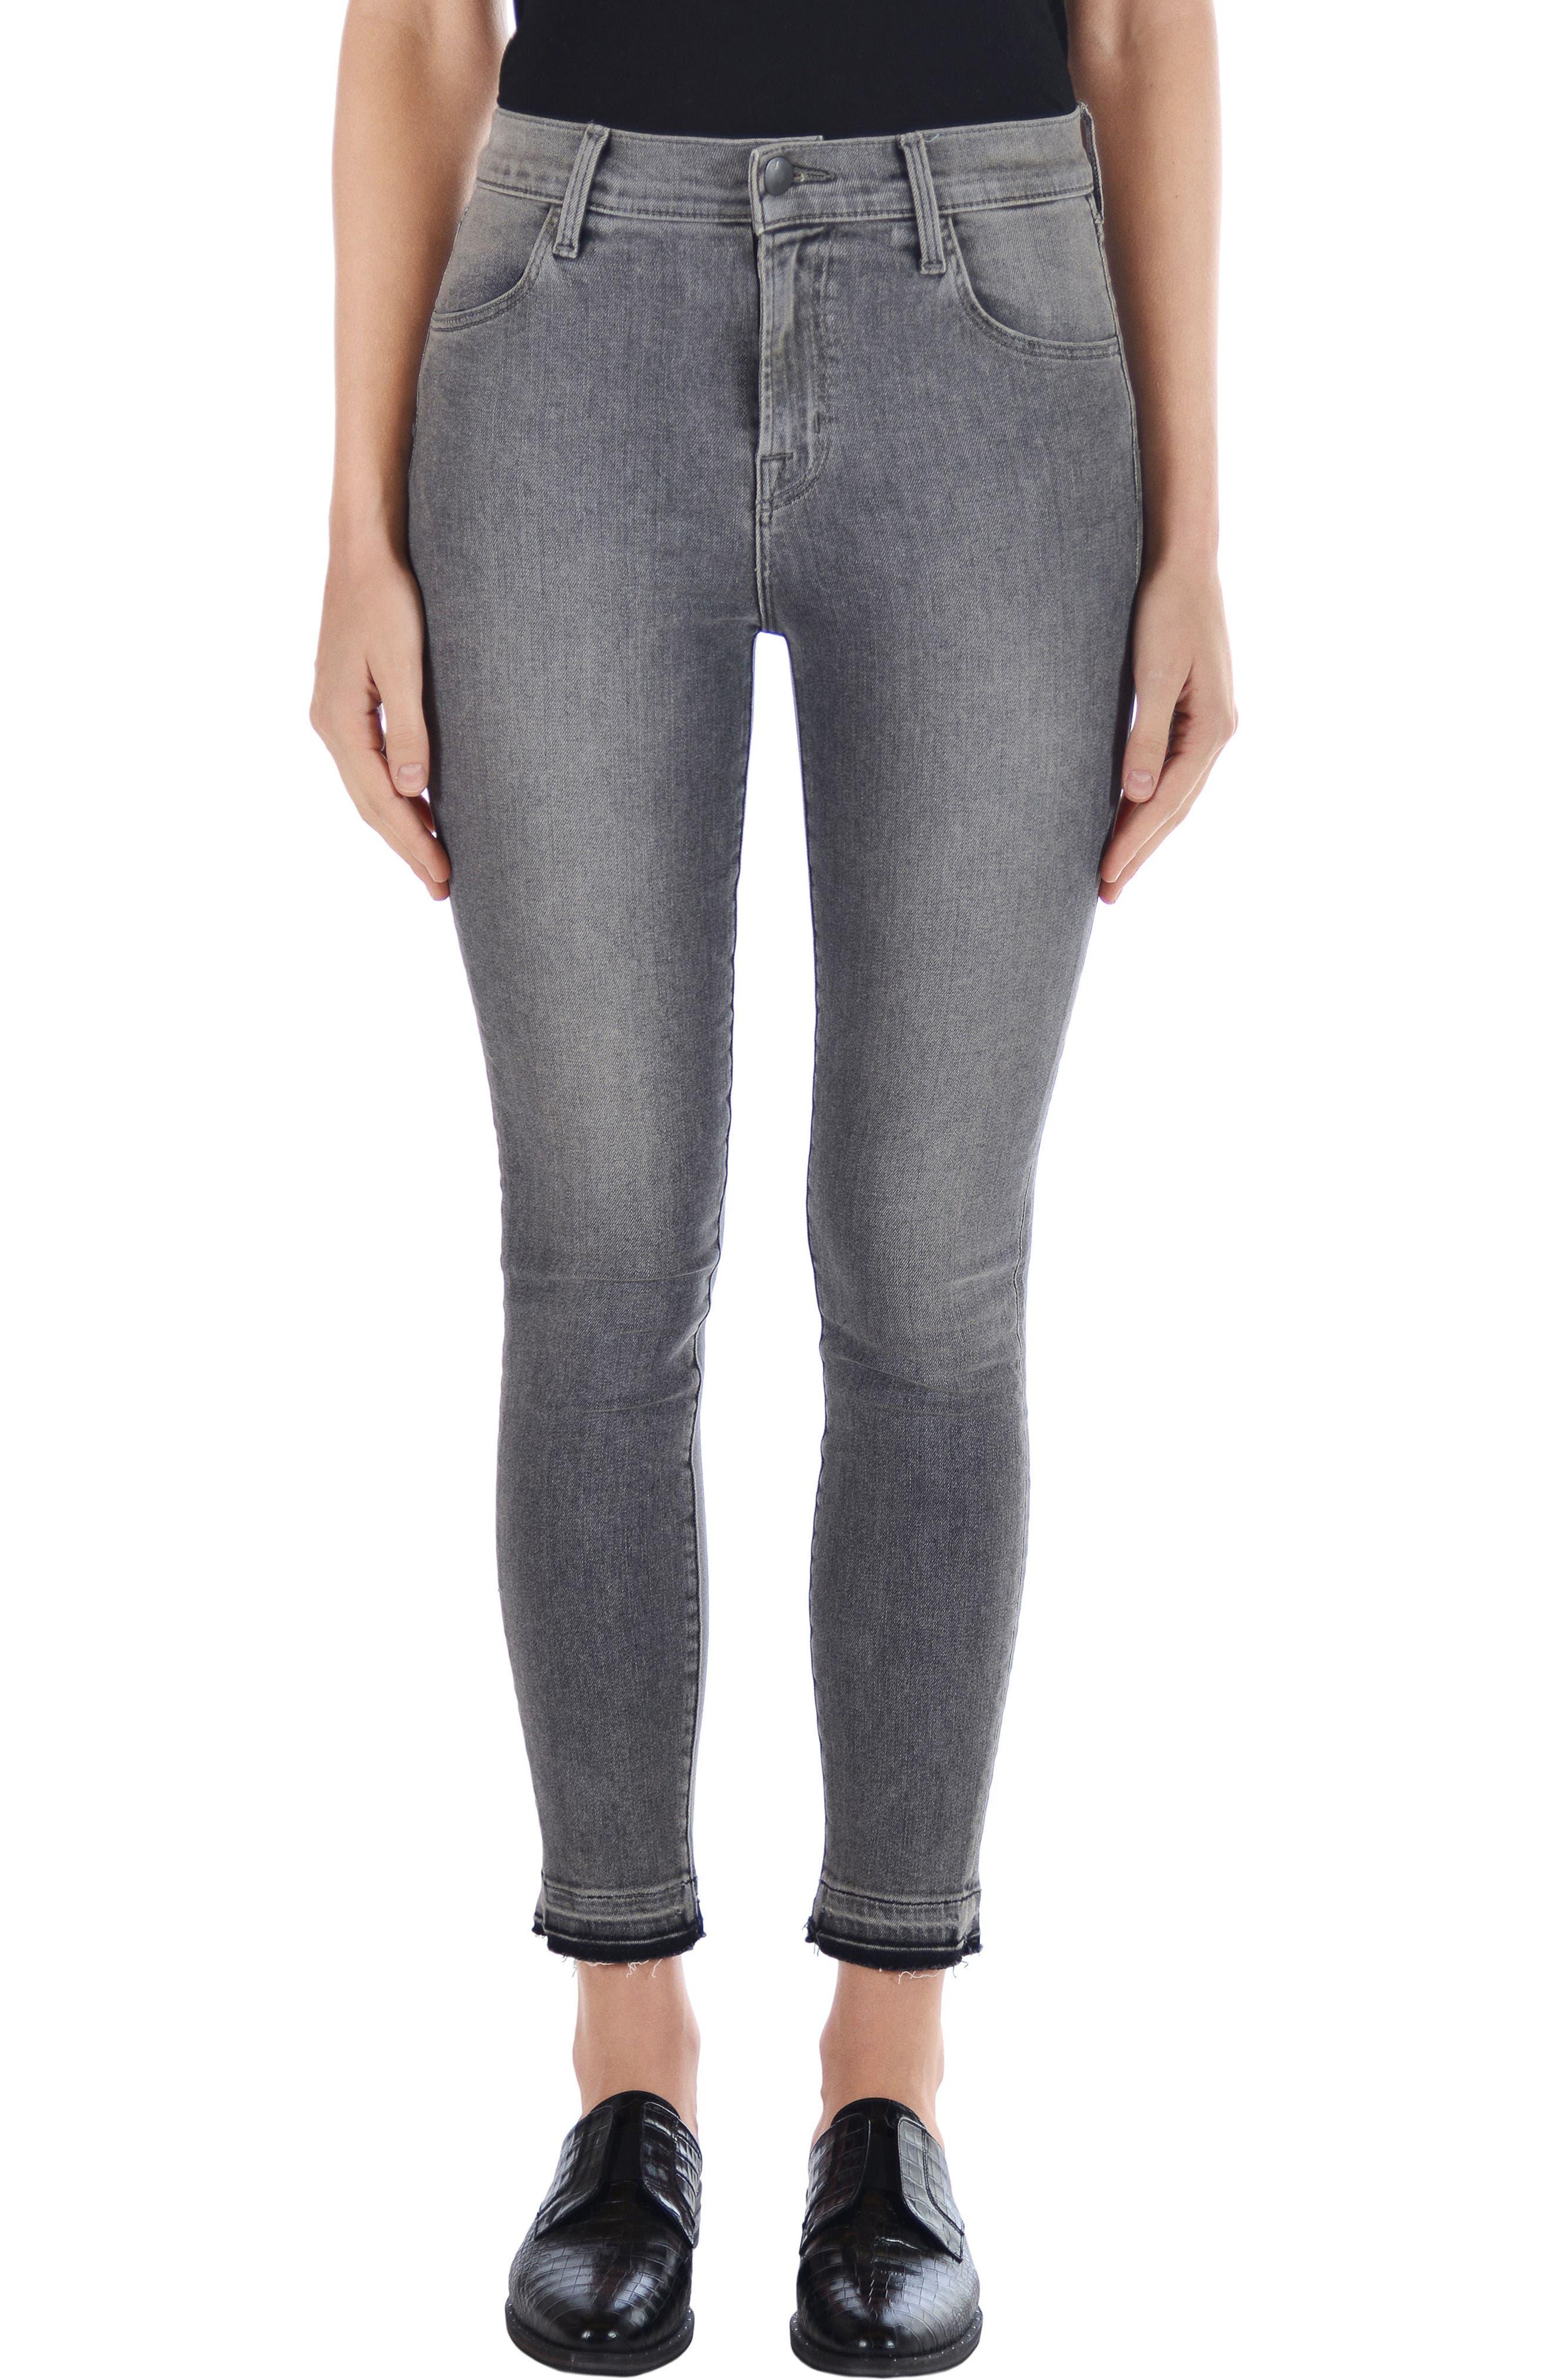 Alana High Waist Ankle Skinny Jeans,                         Main,                         color, 030